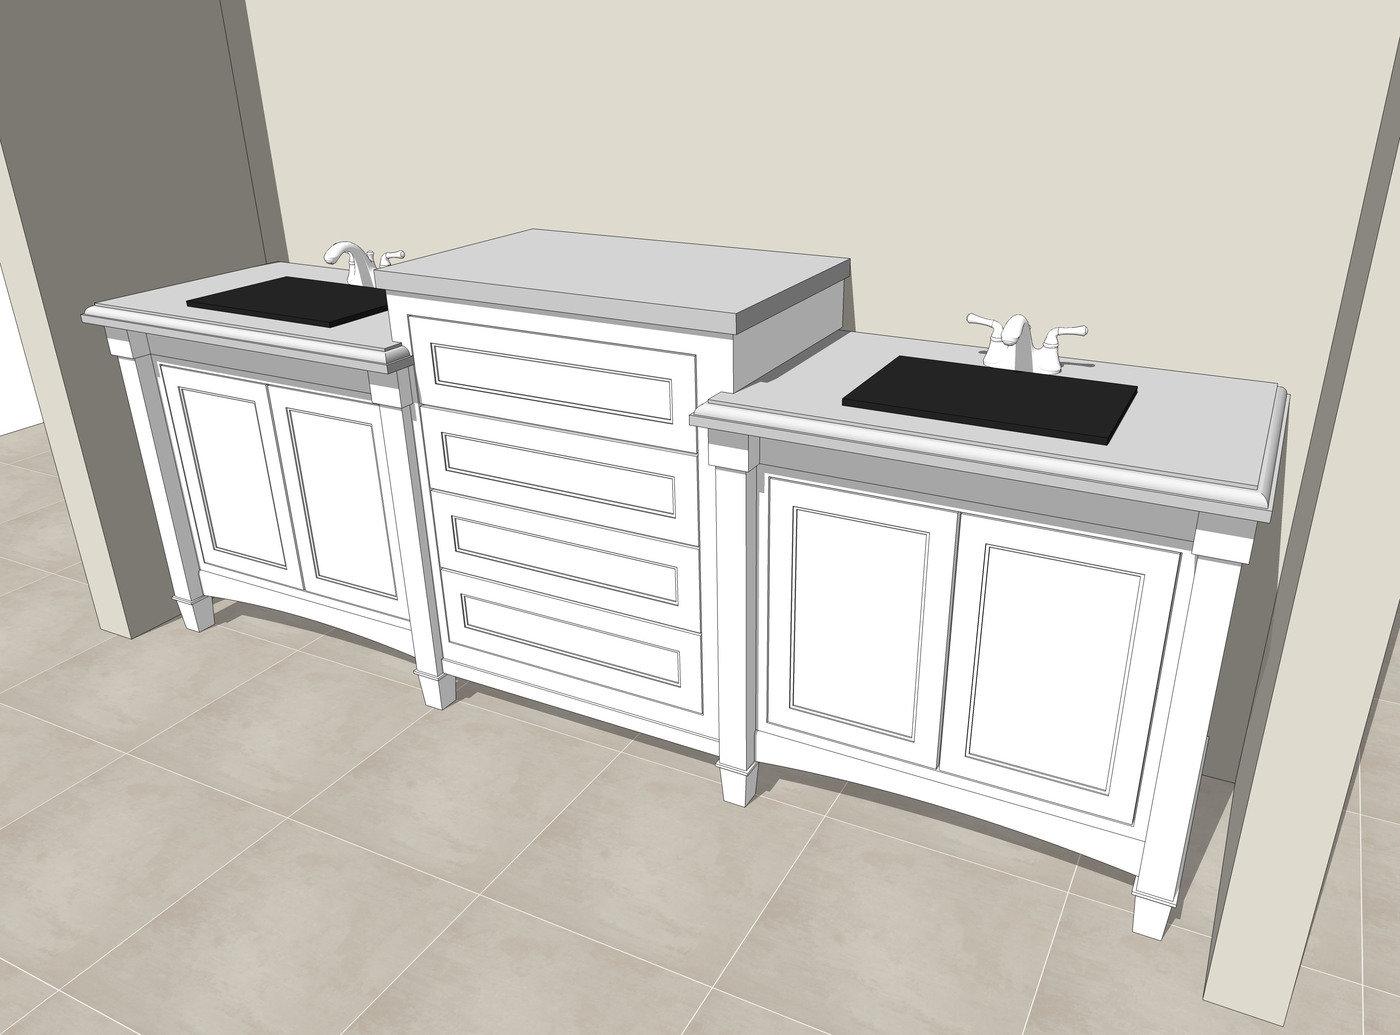 Interior Design Free SketchUp Models by AG CAD Designs at Coroflot com